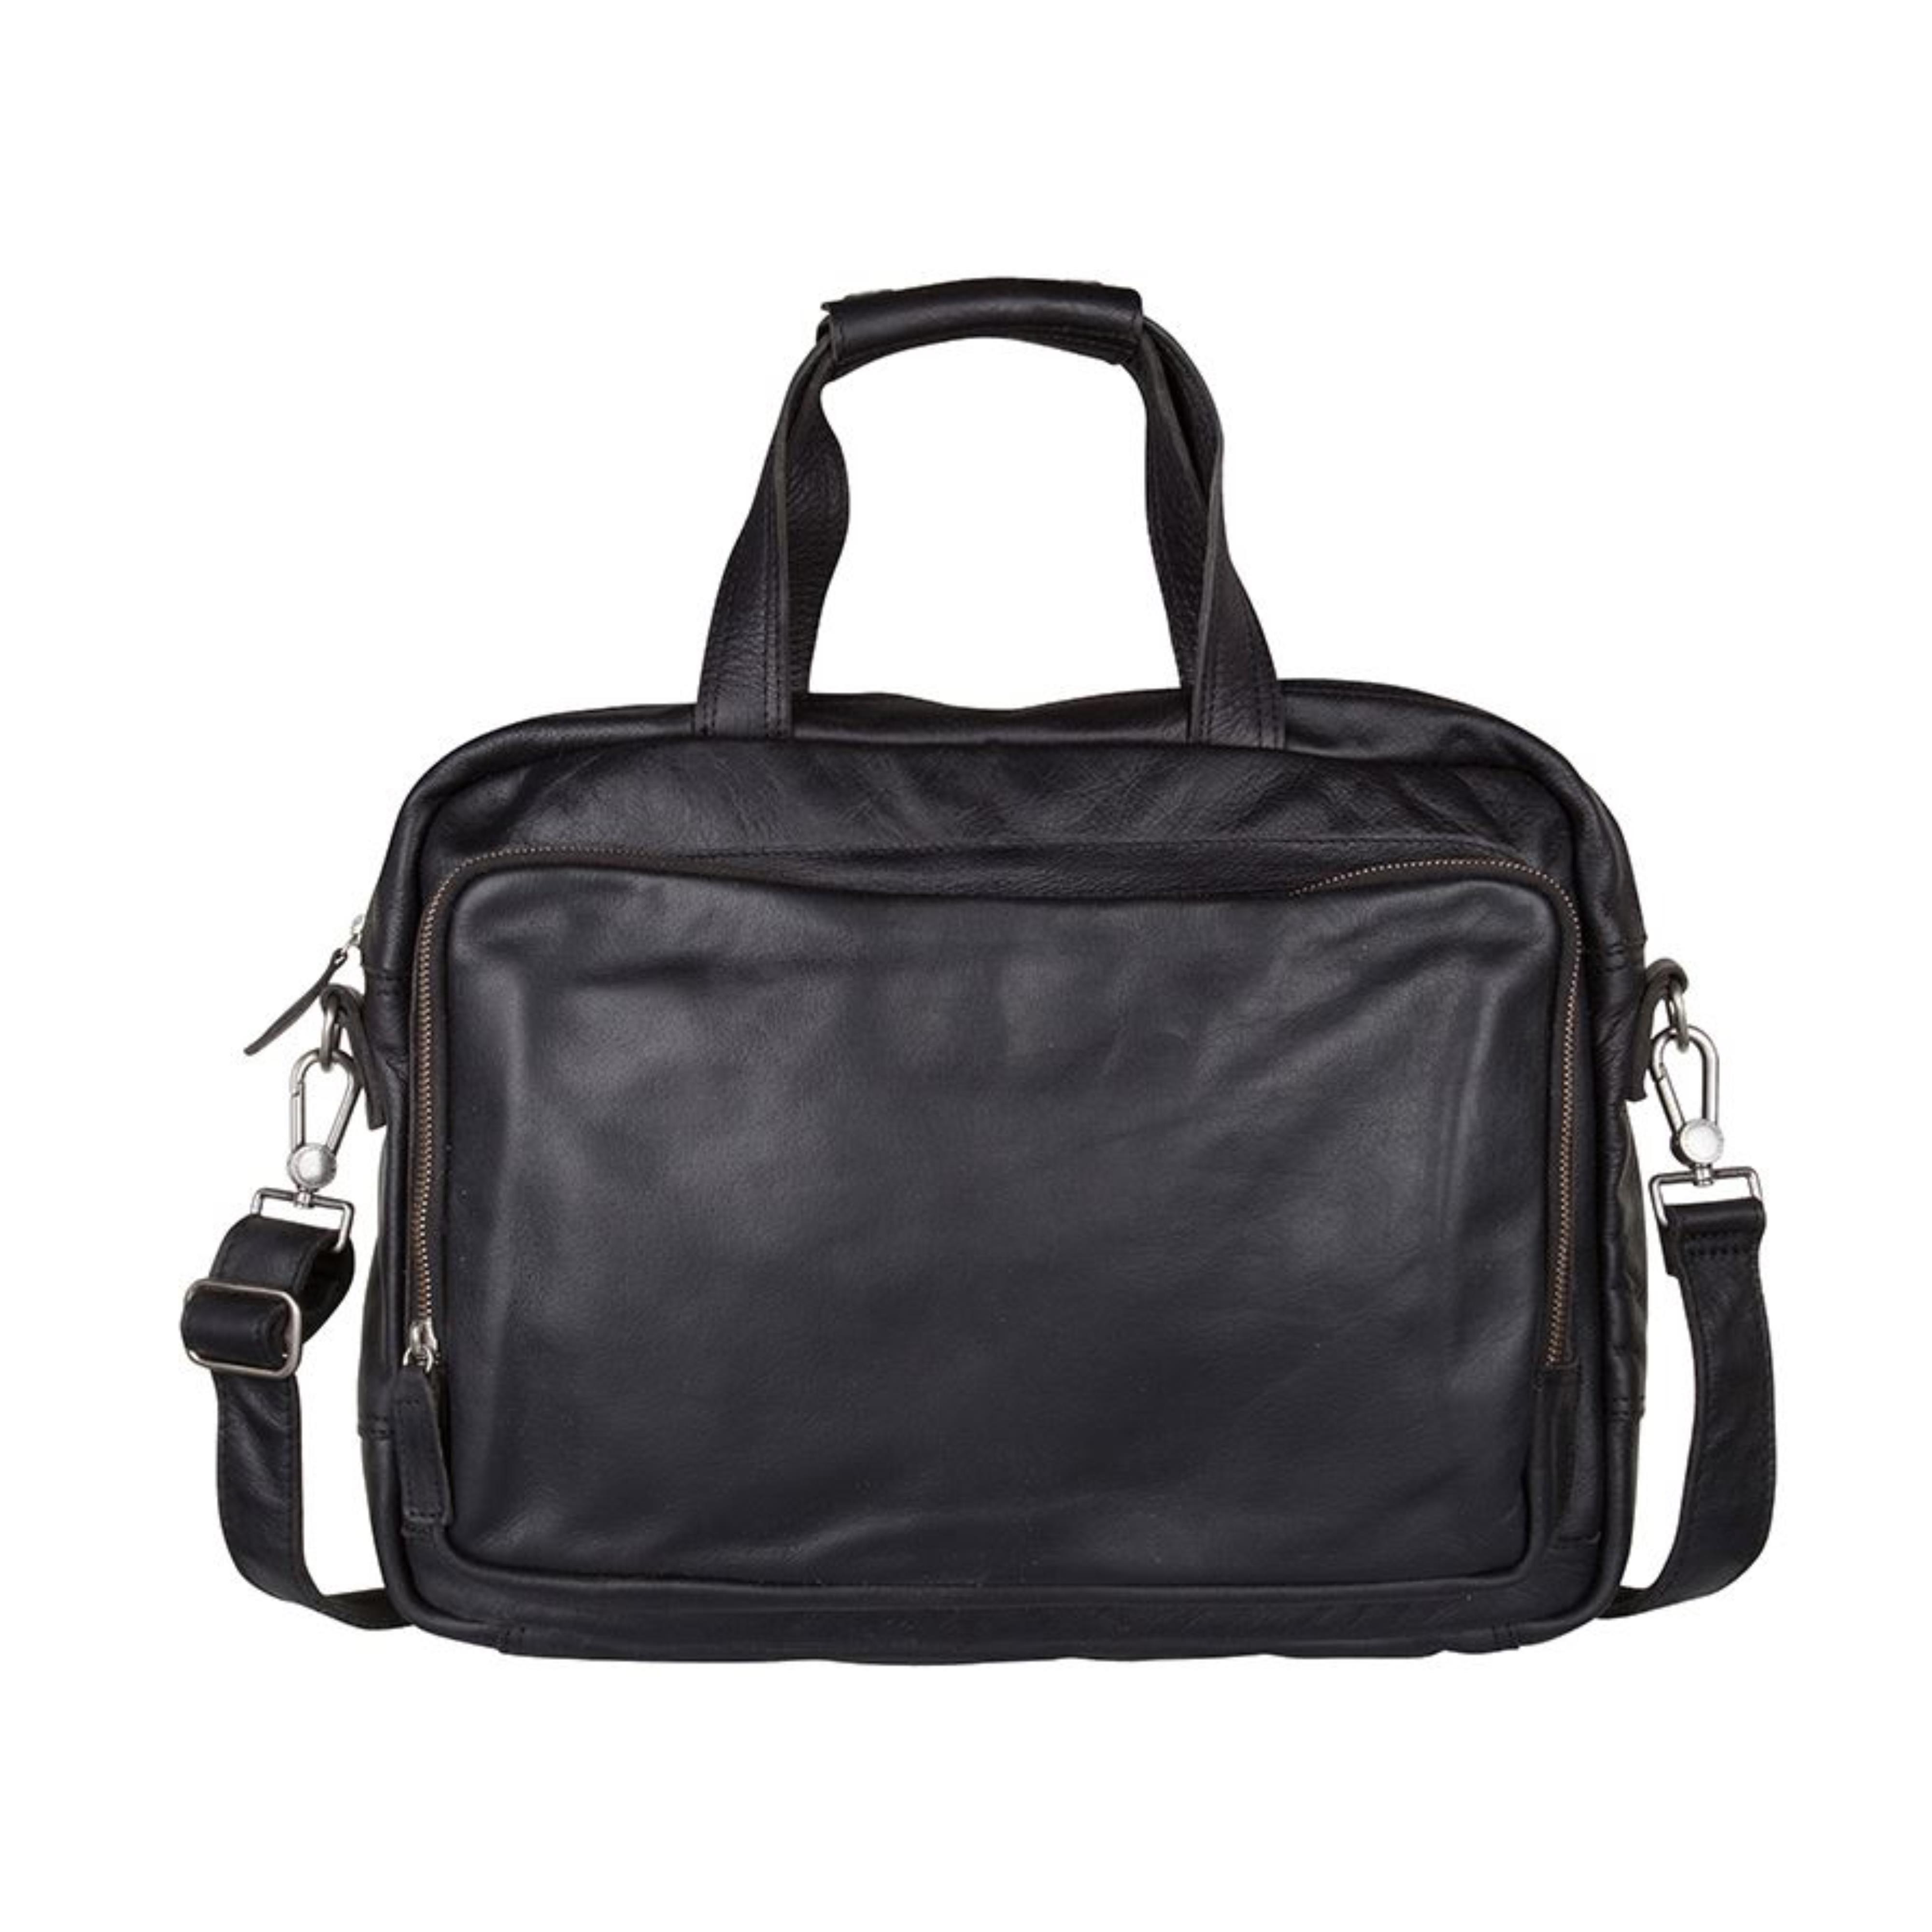 0a60e8044a187 COWBOYSBAG Tasche Laptoptasche Aktentasche LAPTOP BAG BUDE 15.6 INCH Black  1524 001 ...